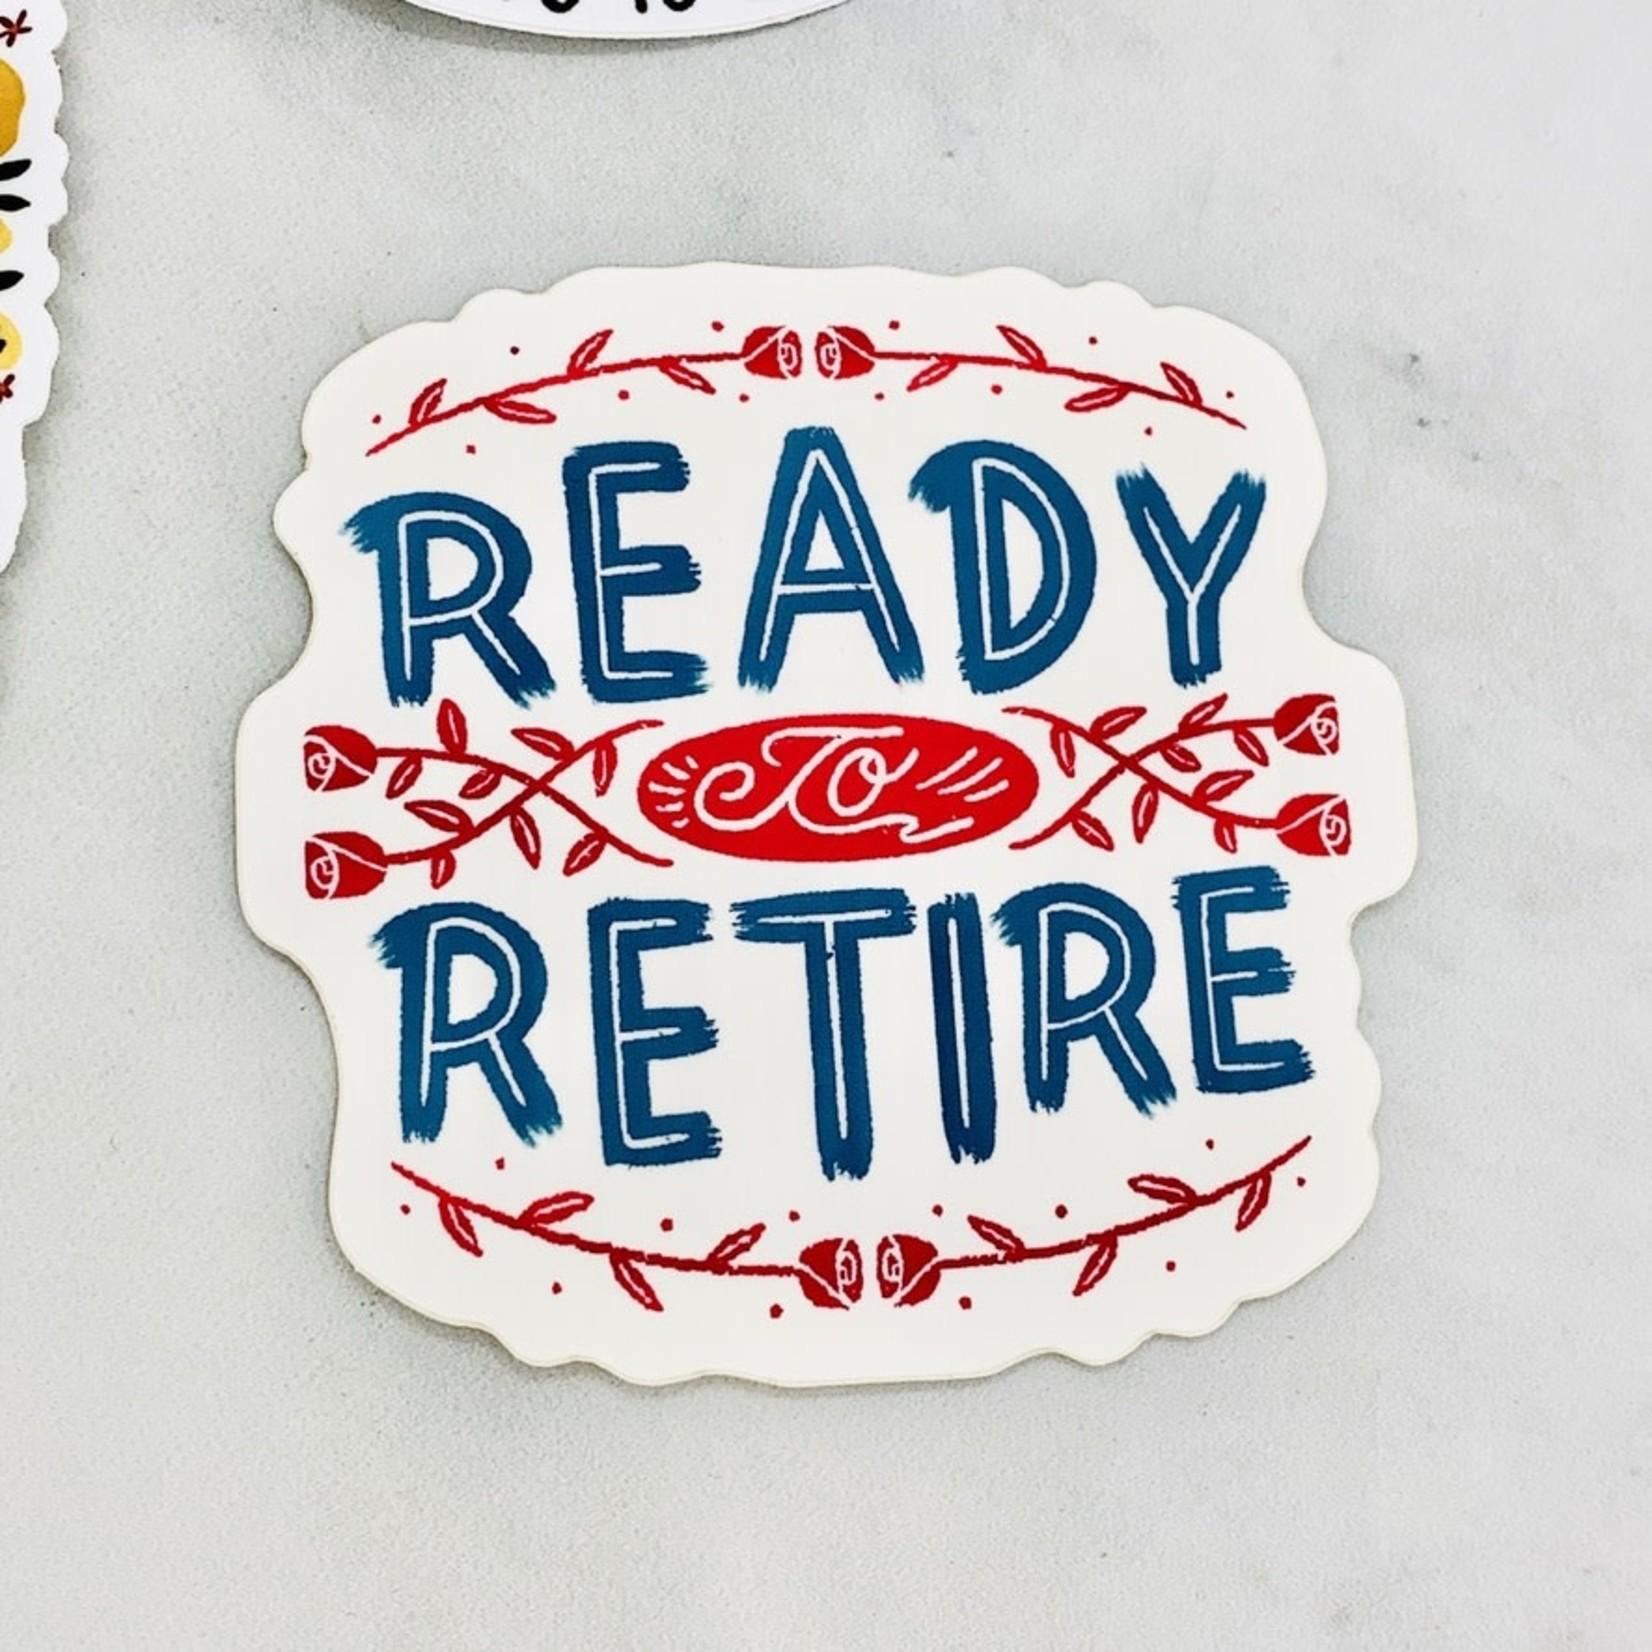 Bench Pressed Ready to Retire Sticker